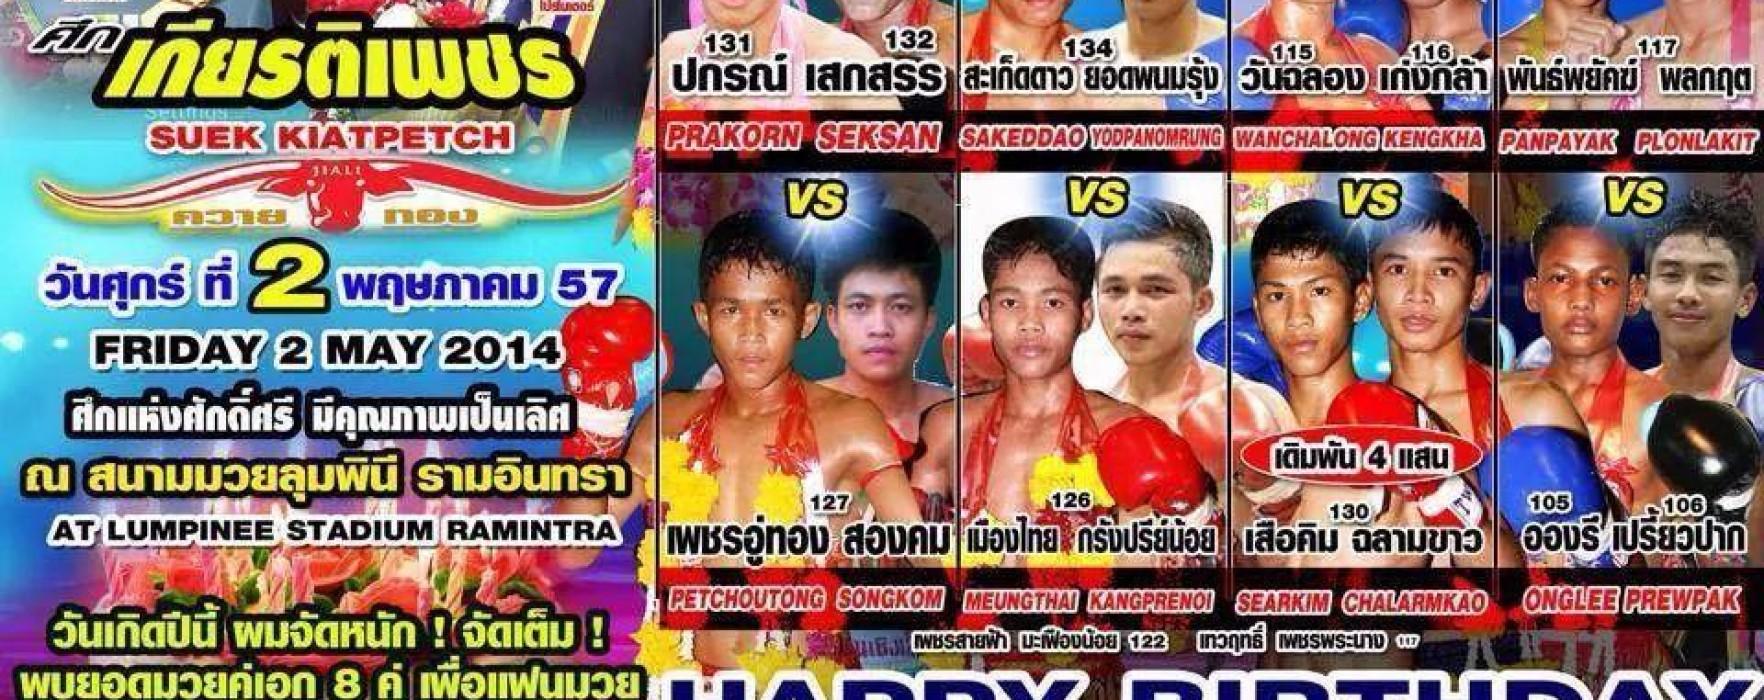 Saketdao, Saeksan, Pakorn & Serkim at new Lumpinee May 2nd